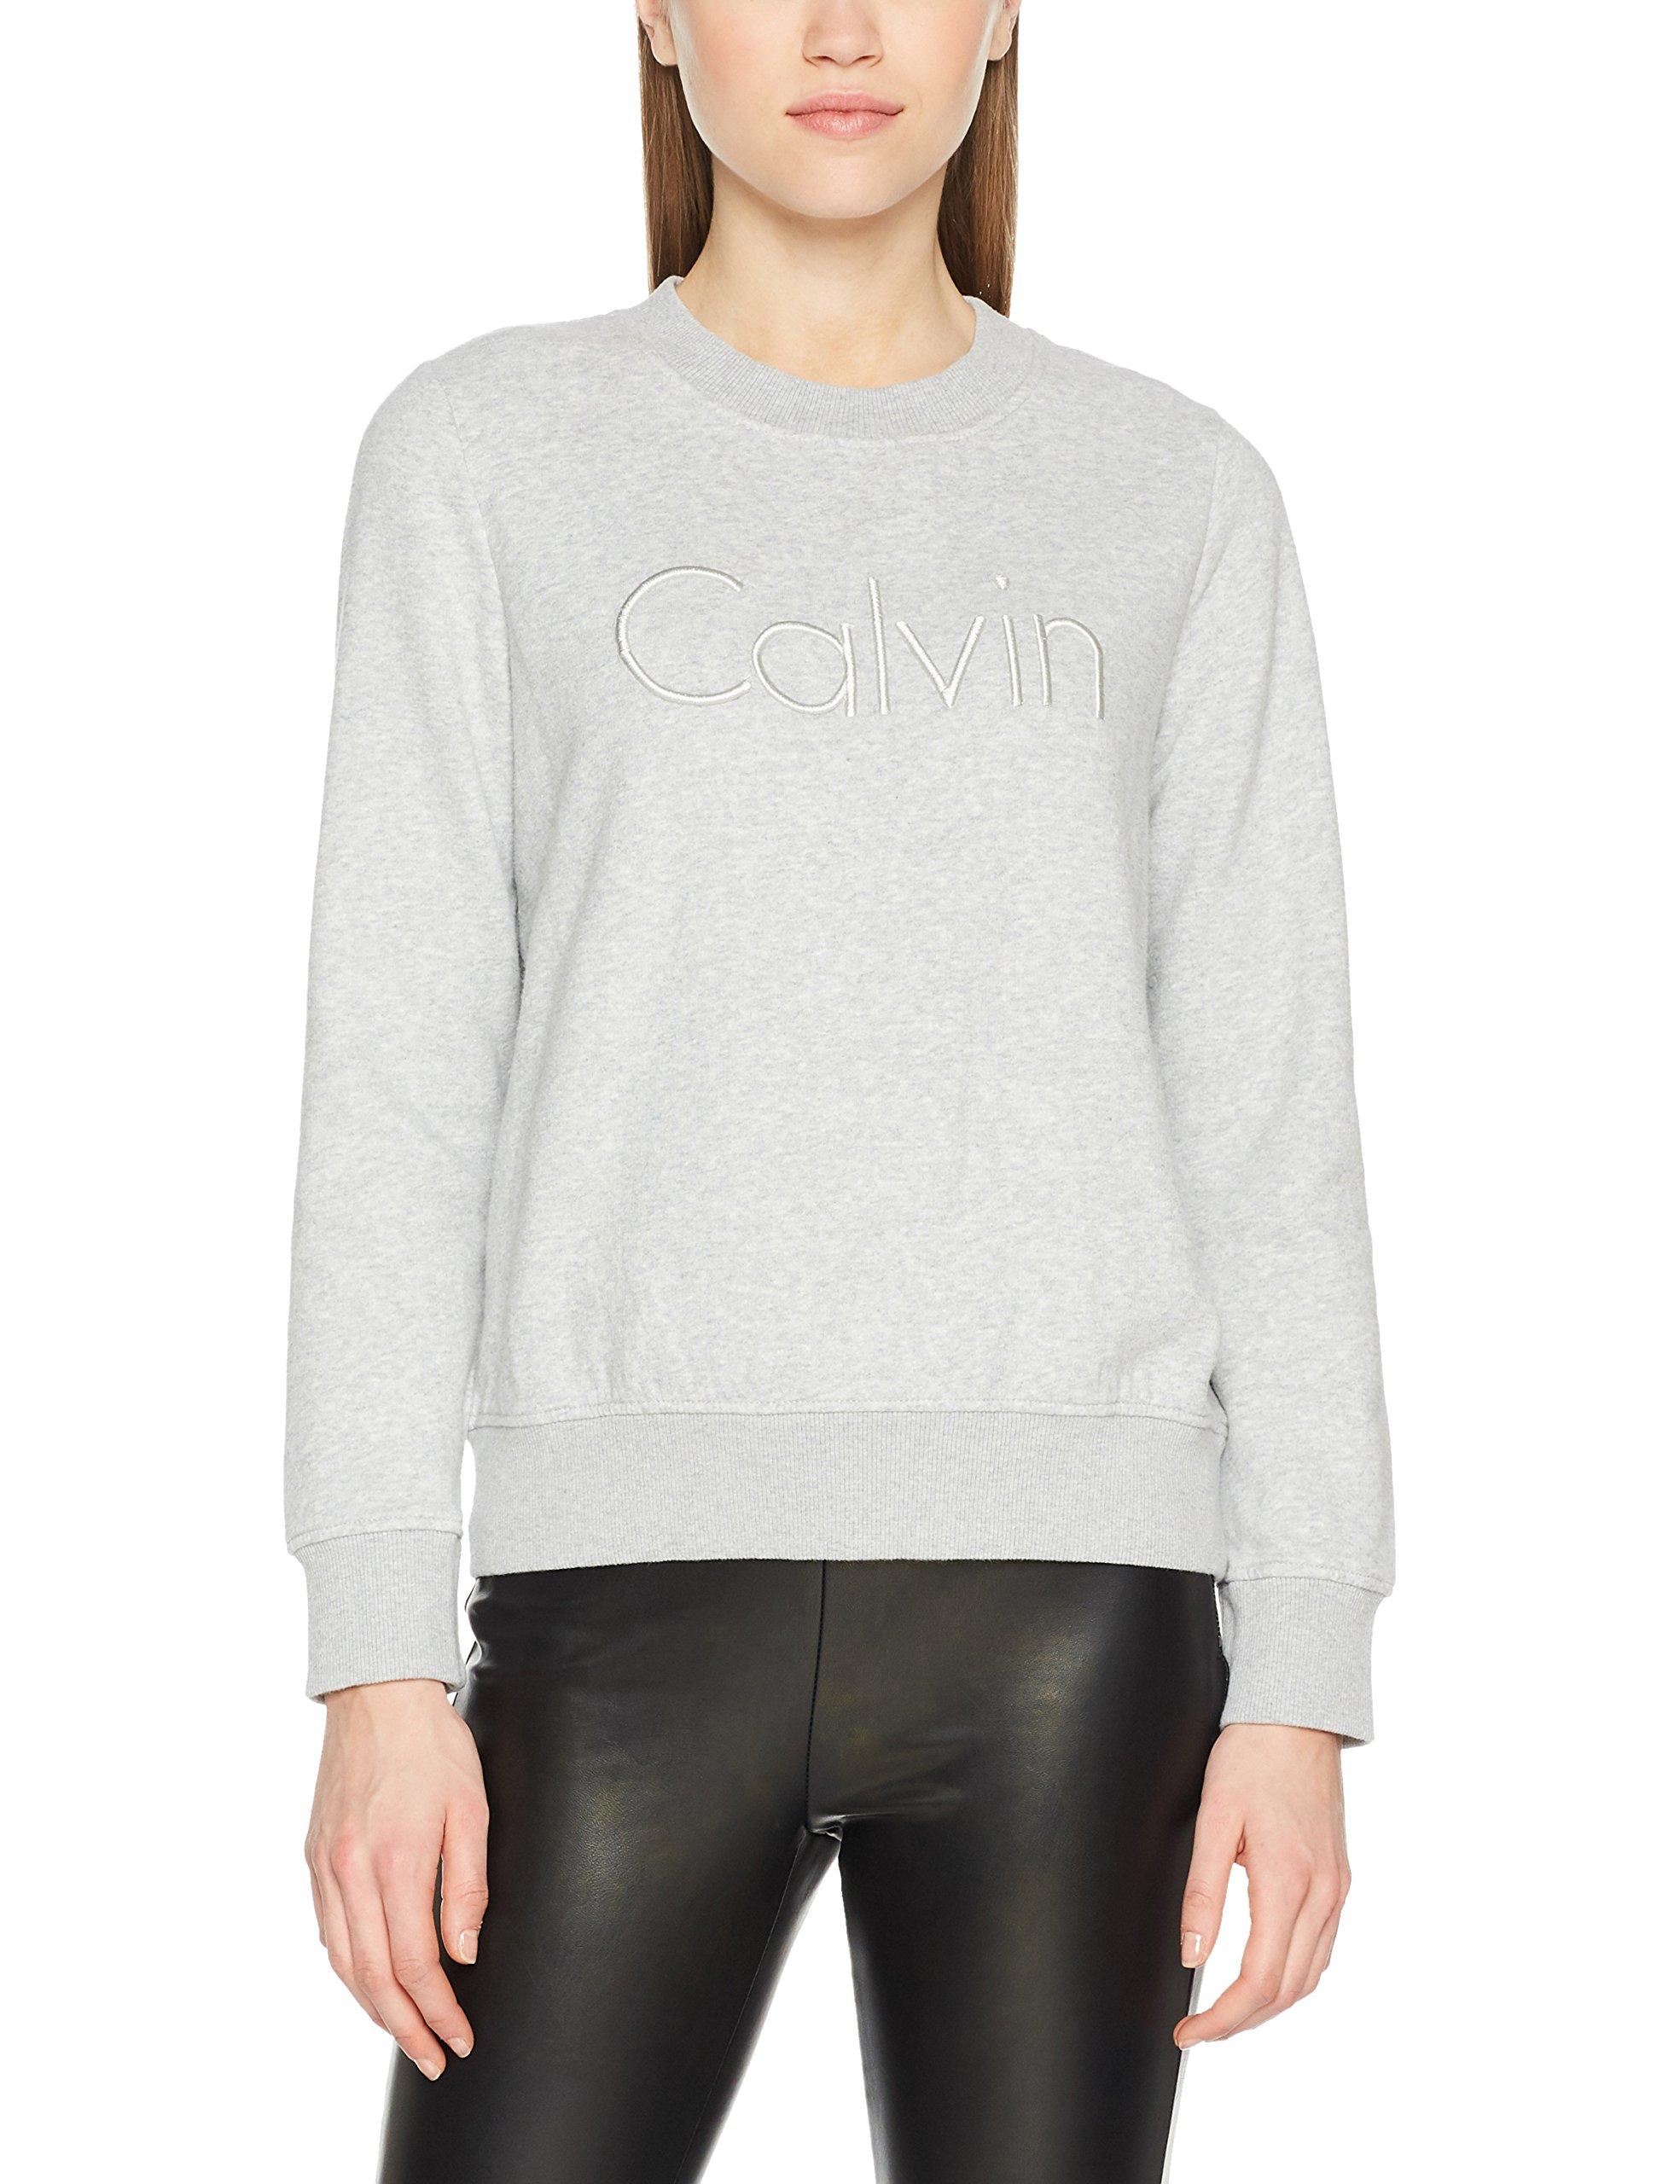 Heather Femme Calvin Grey 038Medium Jeans Cn s Klein L Sweat shirtGrislight Hondi Hwk EHDIeYbW29